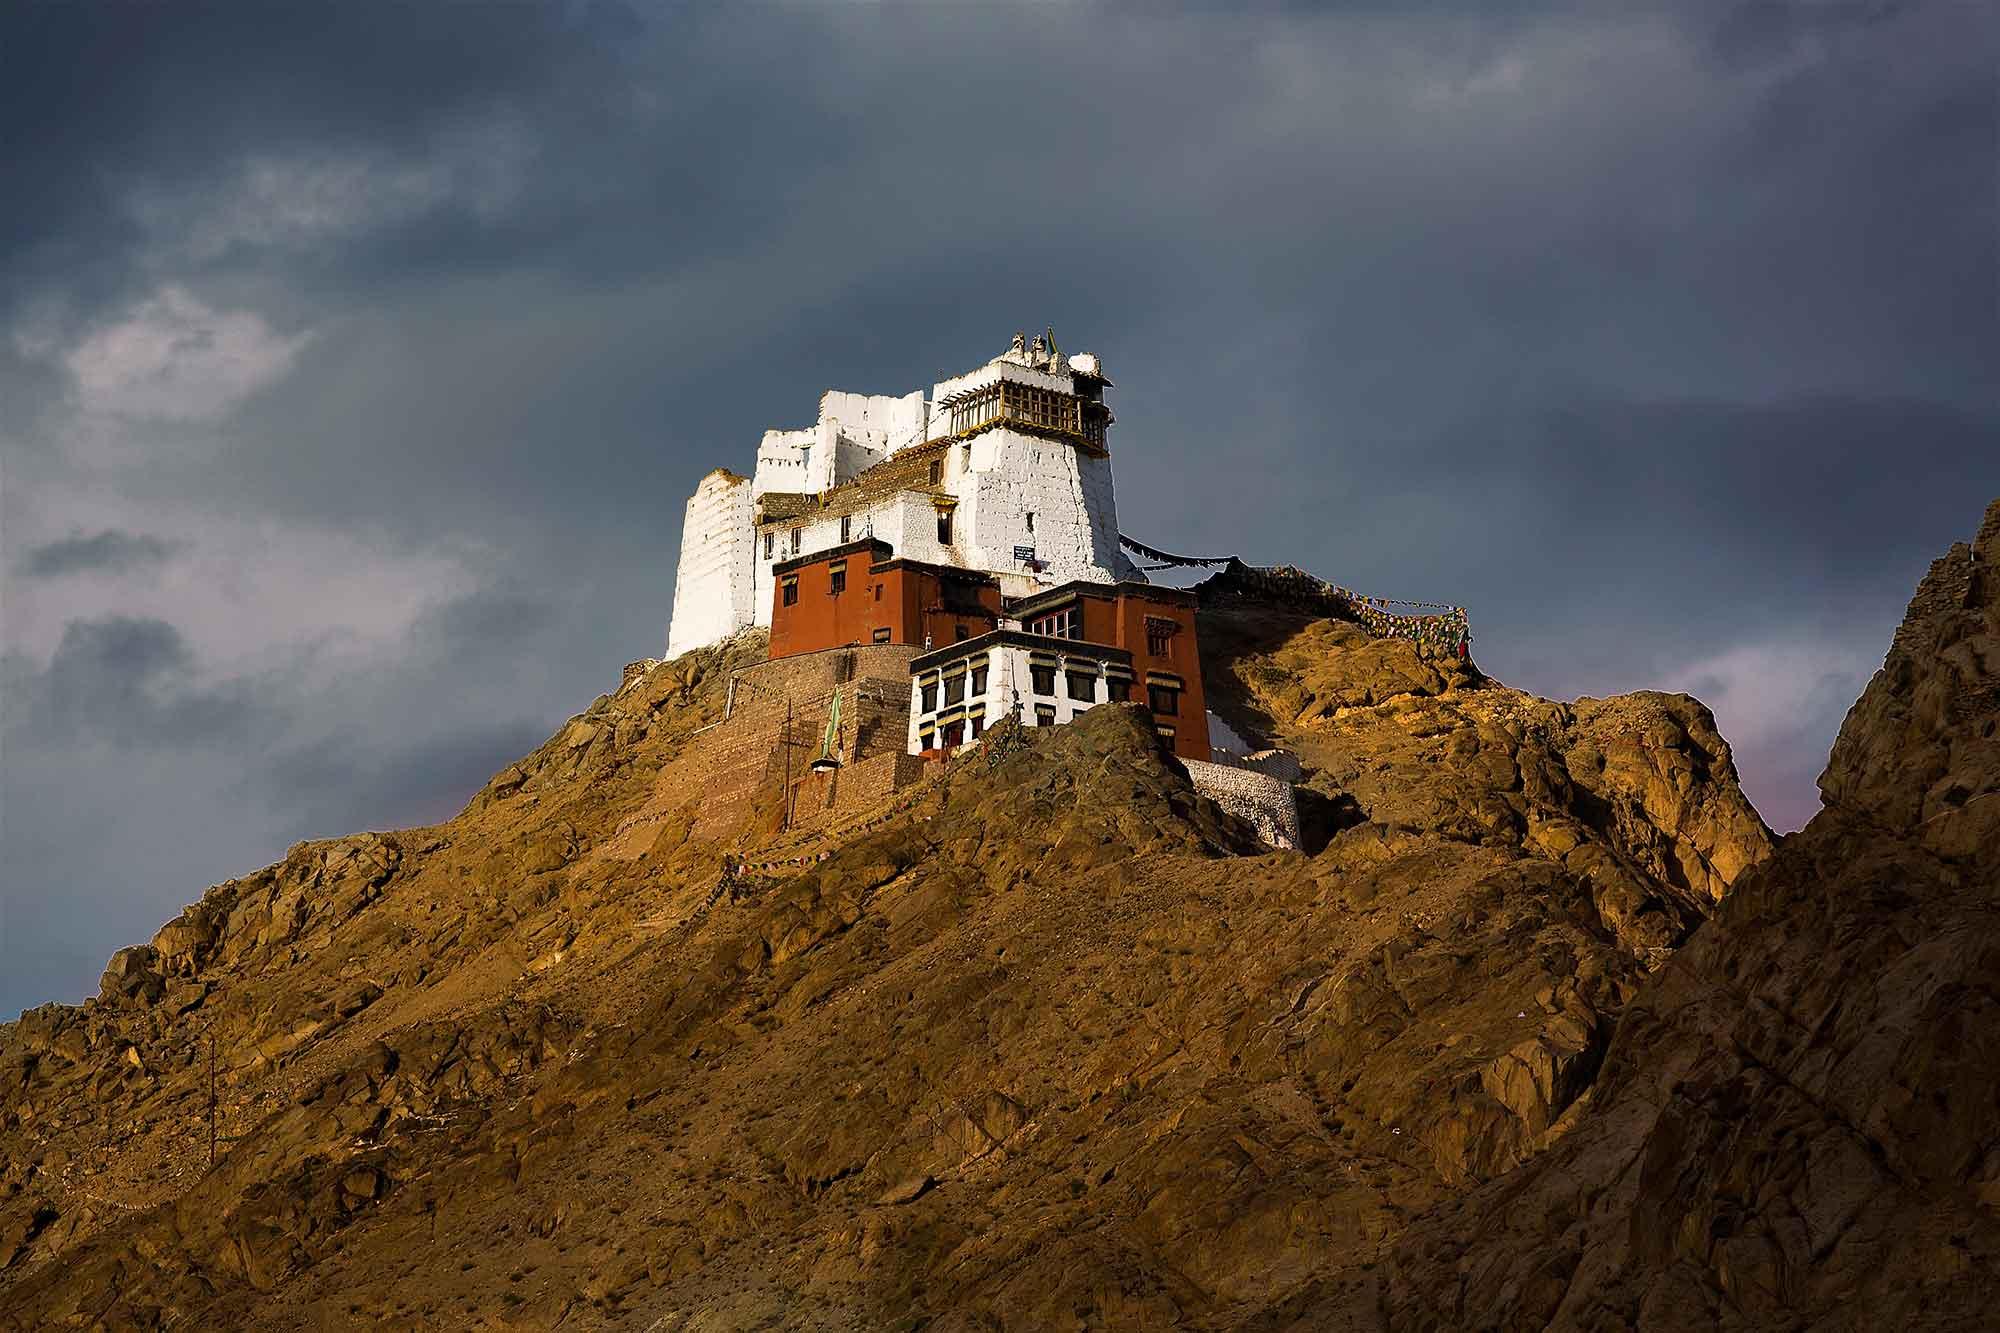 Namgyal-Tsemo-gompa-leh-ladakh-kashmir-india-3